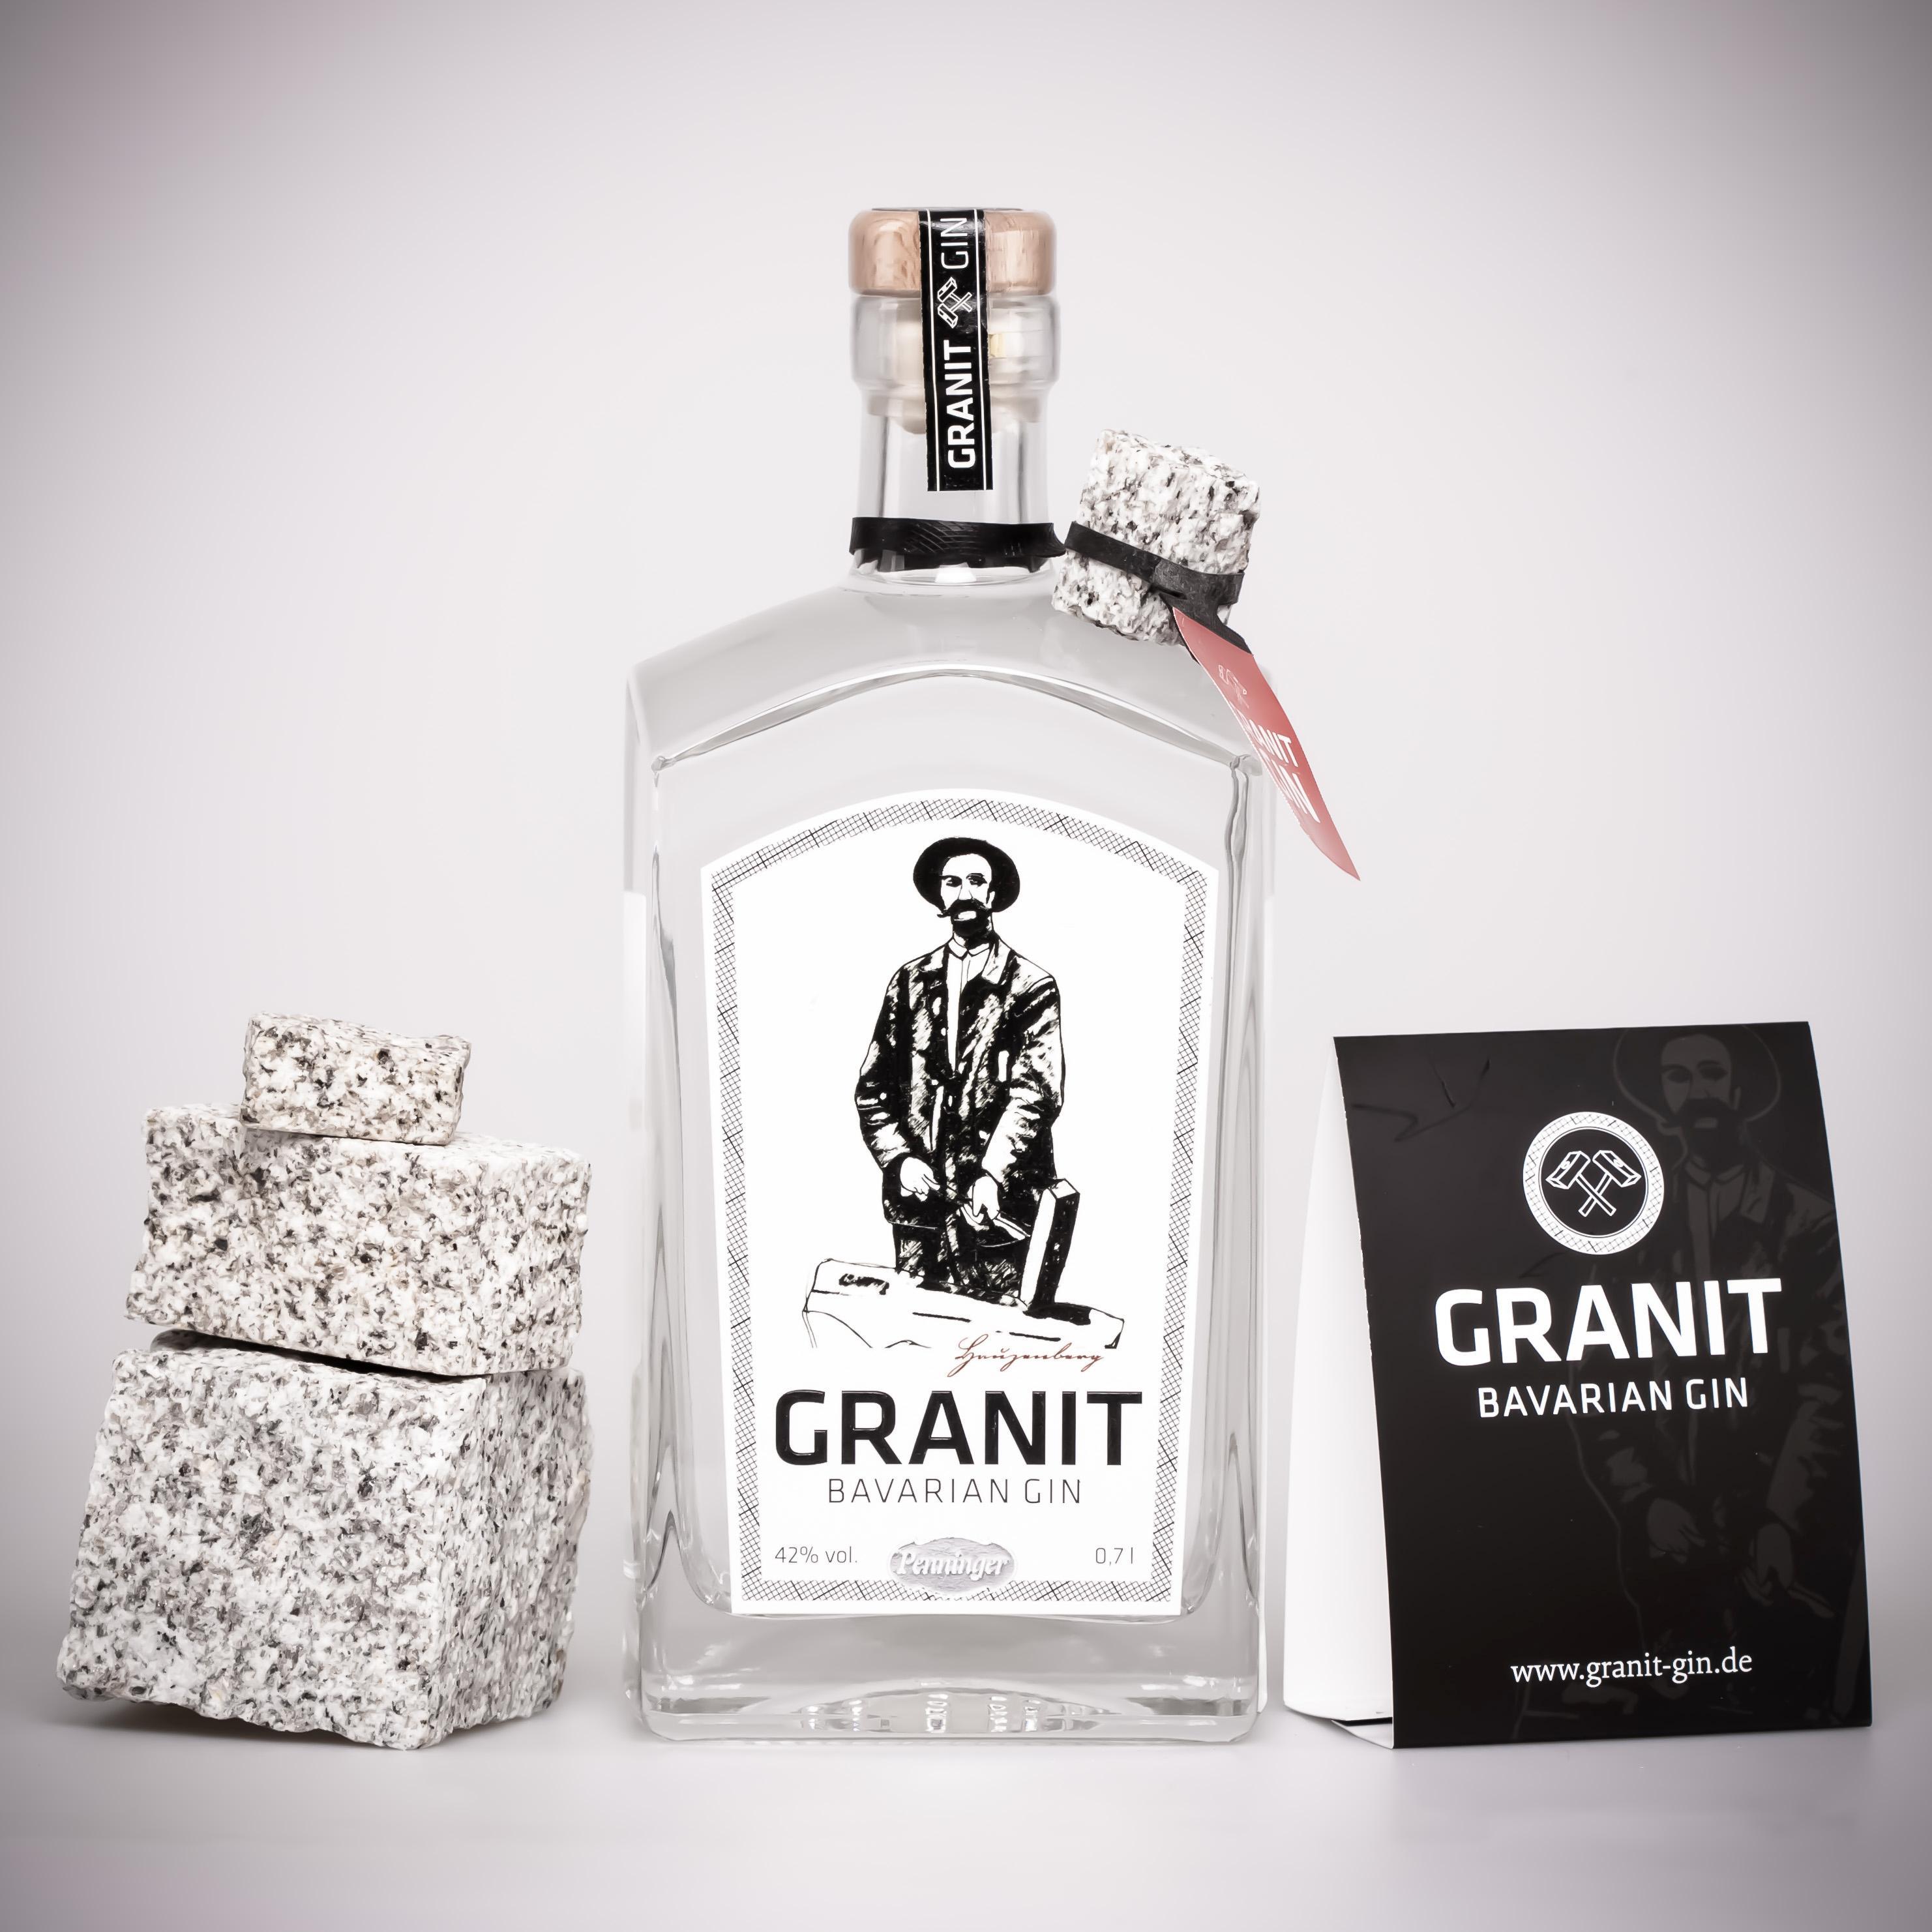 Granit Bavarian Gin (1 x 0,7 l): Amazon.de: Bier, Wein